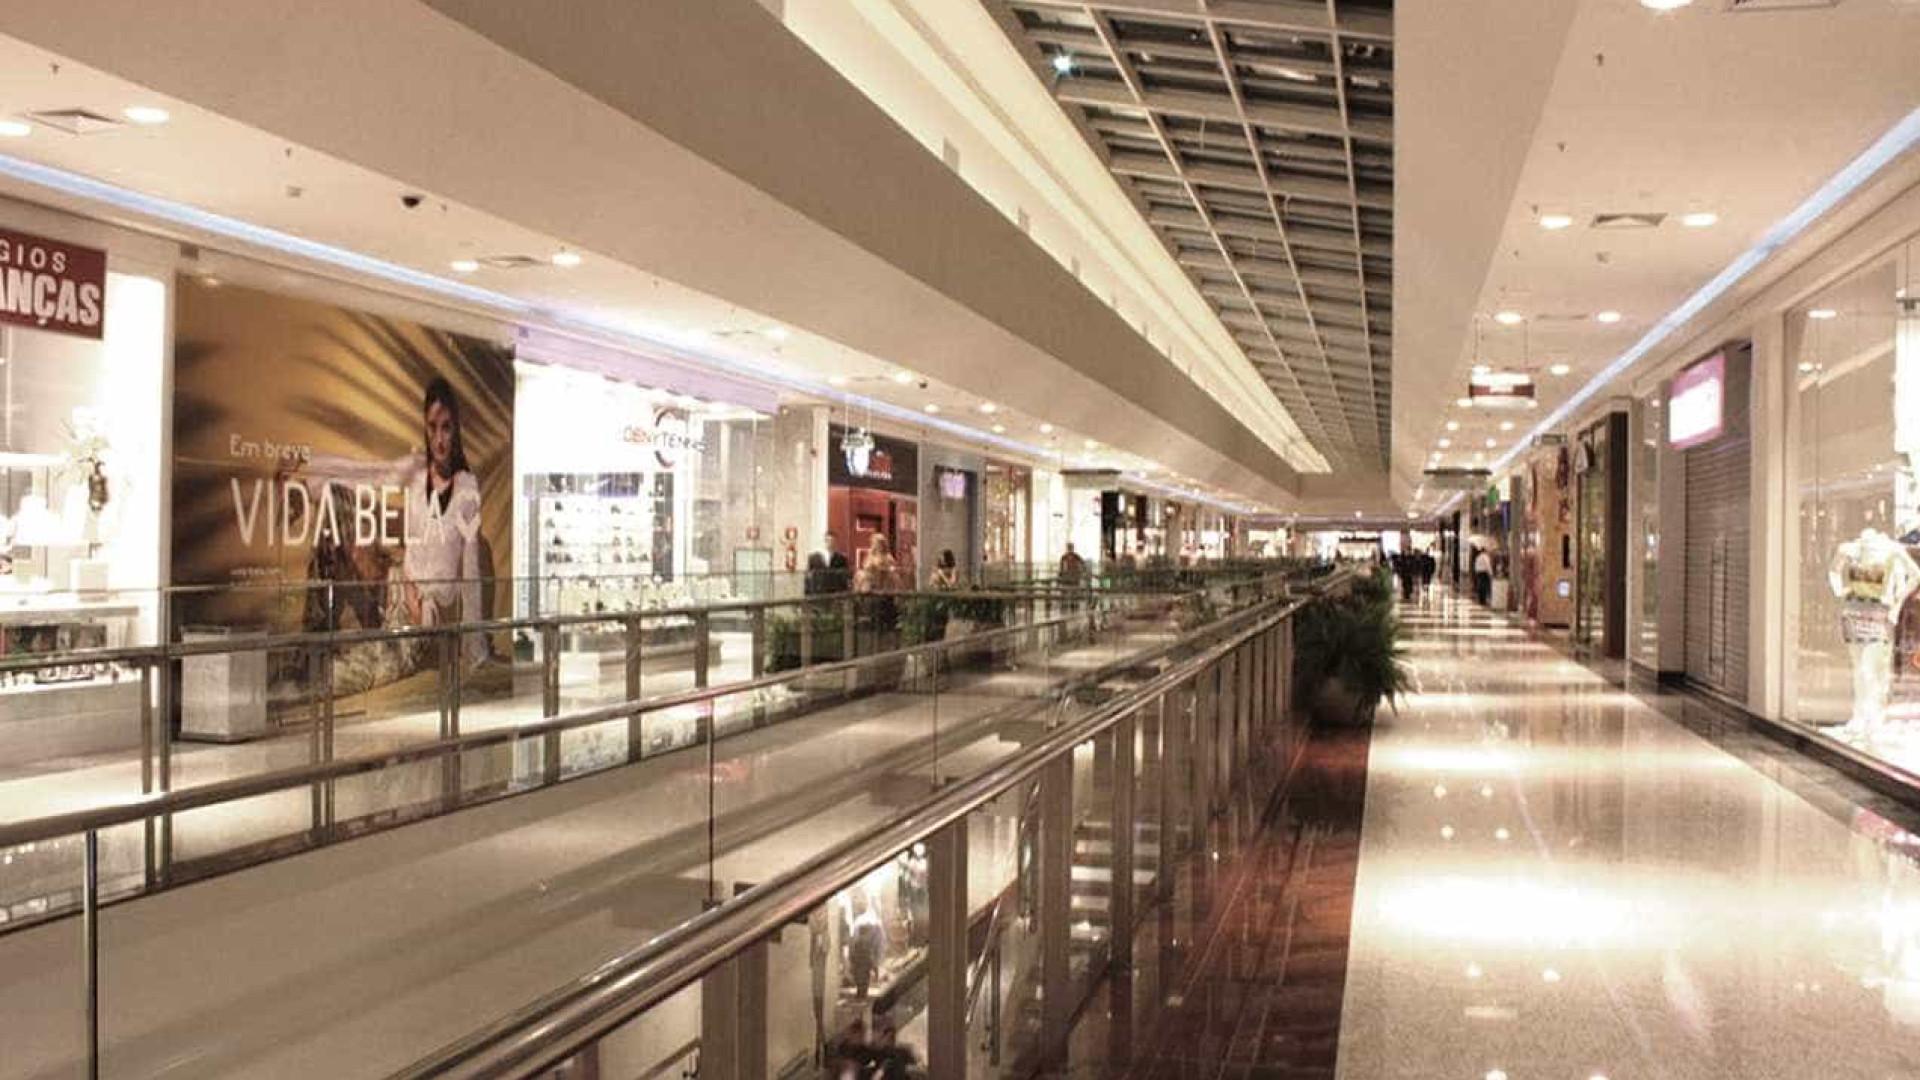 Prefeitura do Rio antecipa abertura de shoppings para amanhã